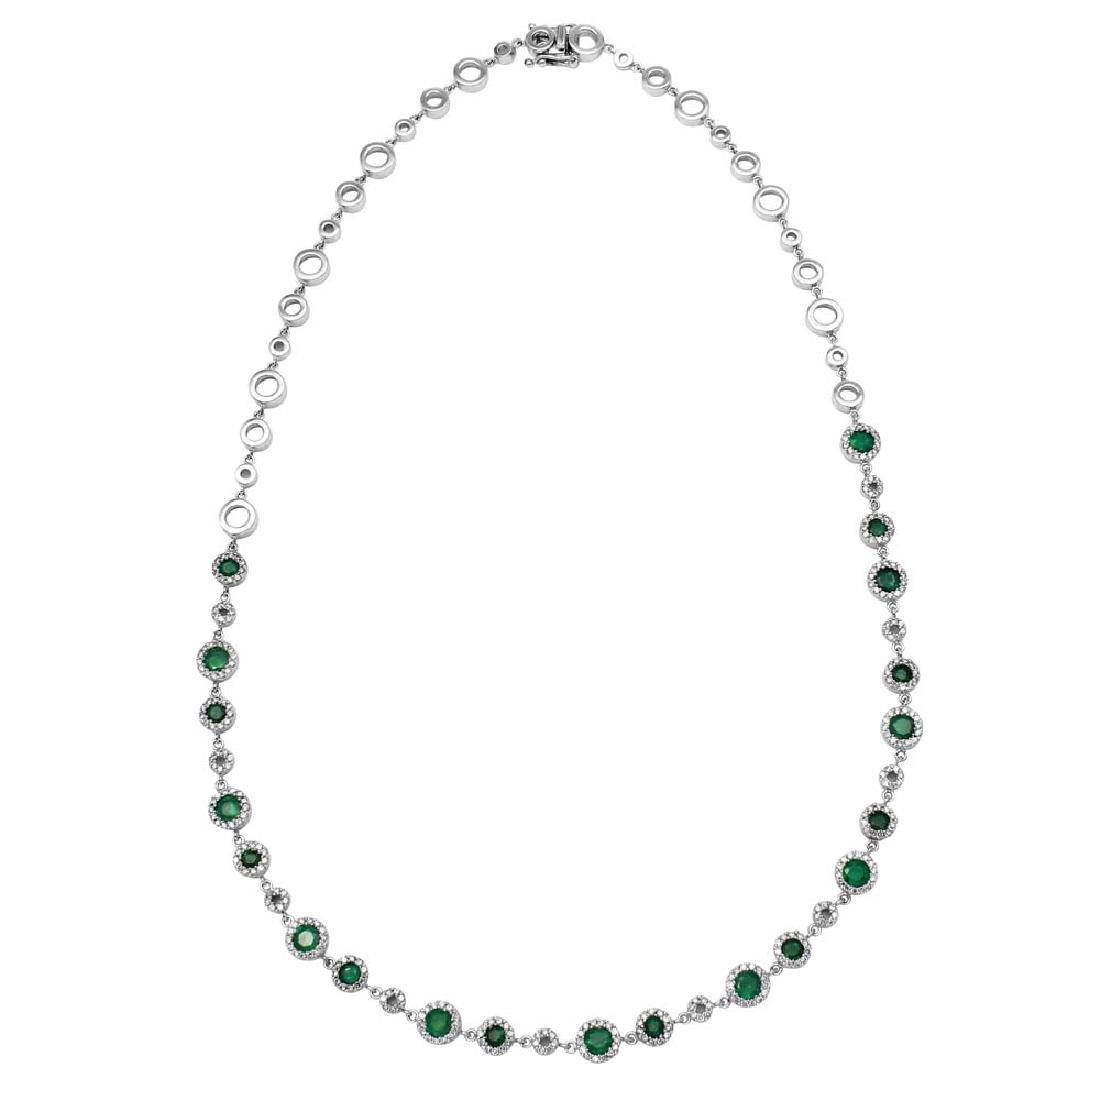 Genuine 1.65 TCW 14K White Gold Ladies Necklace